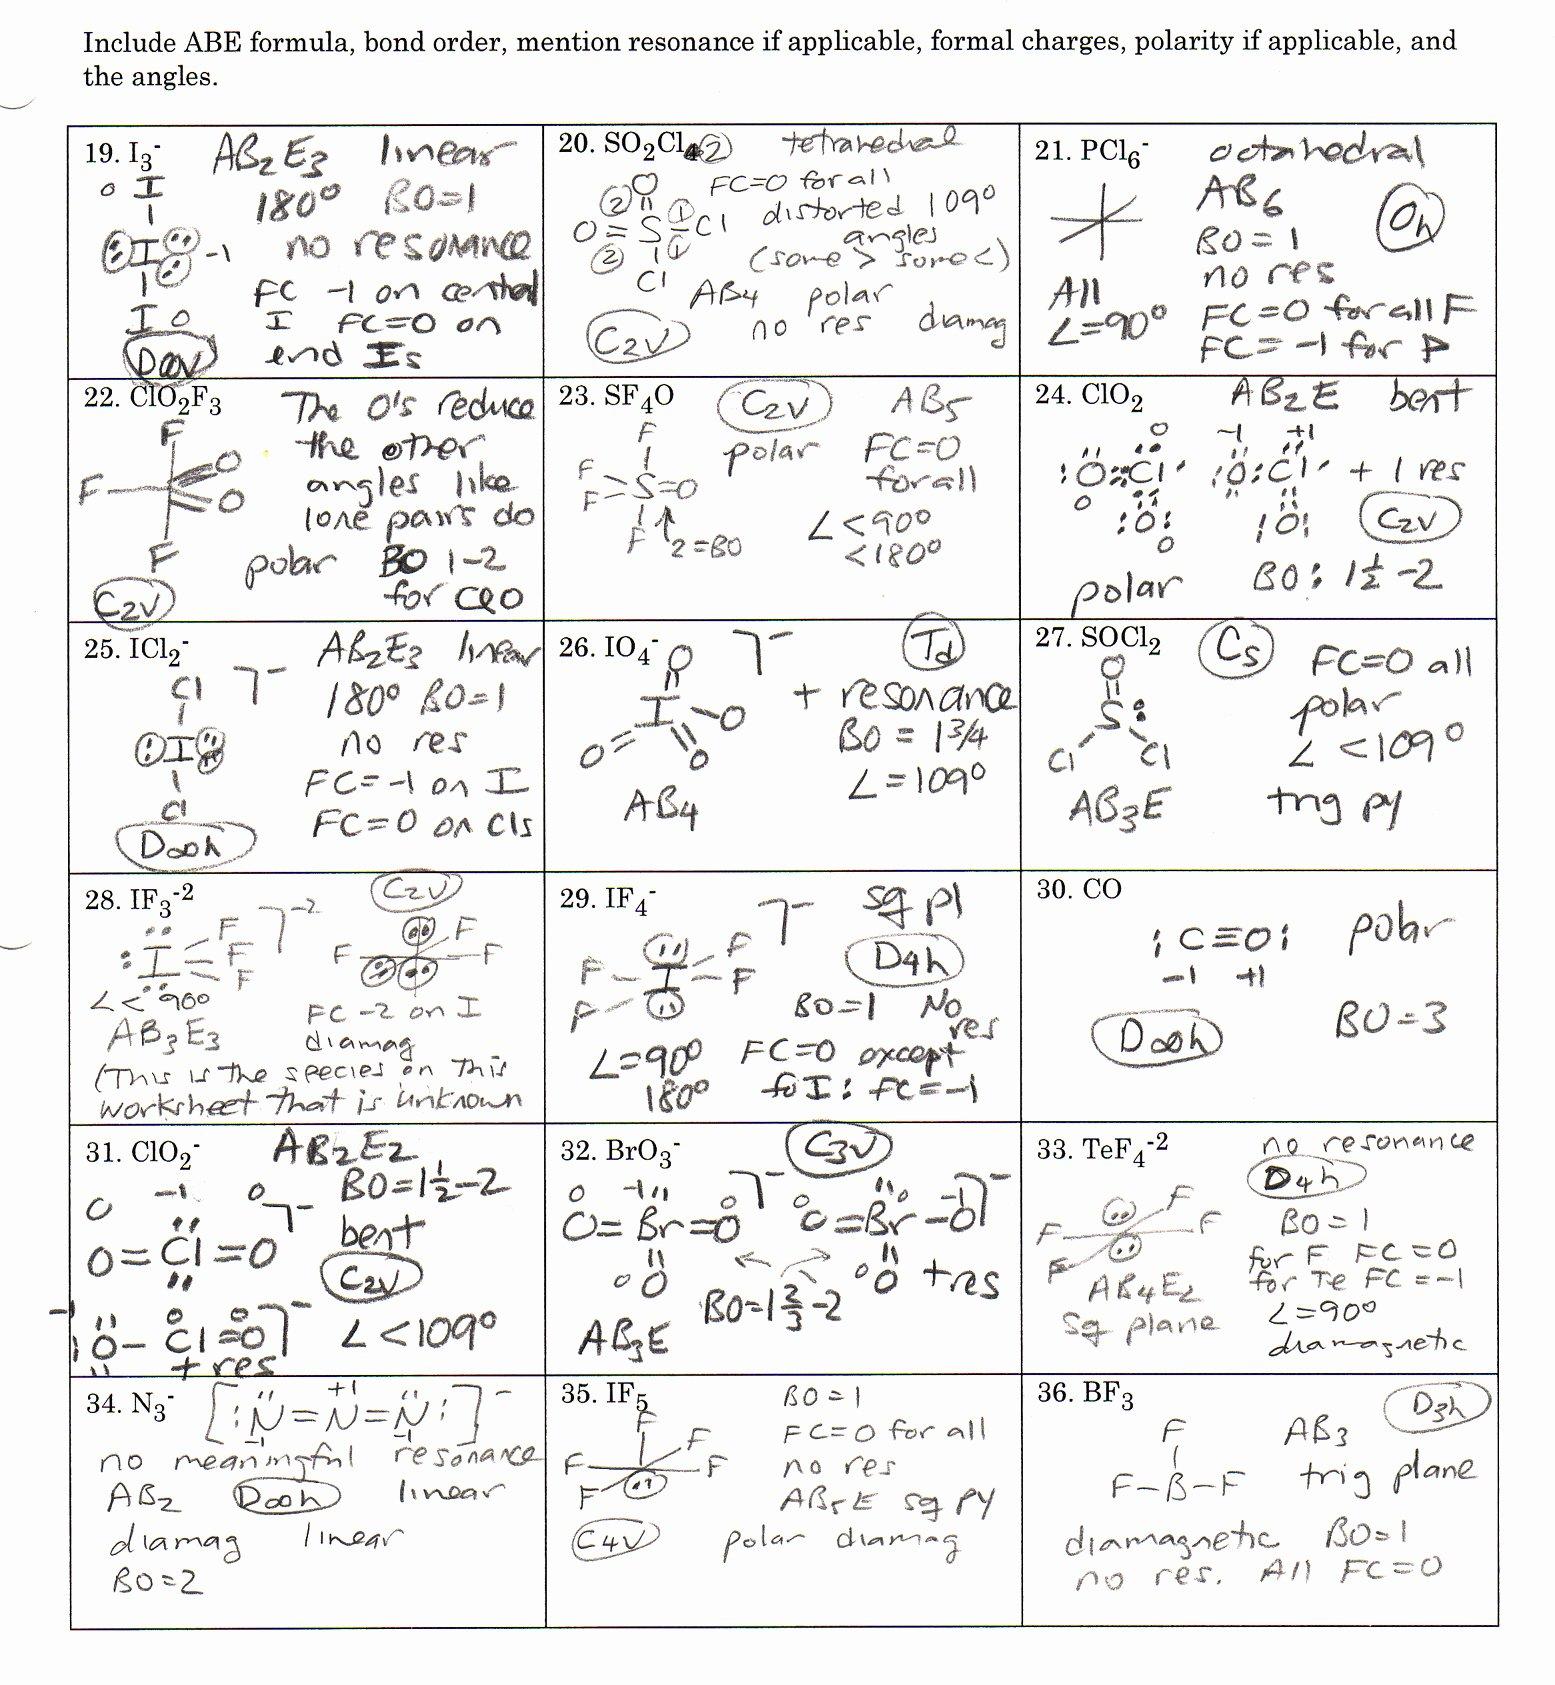 Lewis Dot Structure Worksheet Inspirational Lewis Dot Structure Worksheet with Answers Worksheets